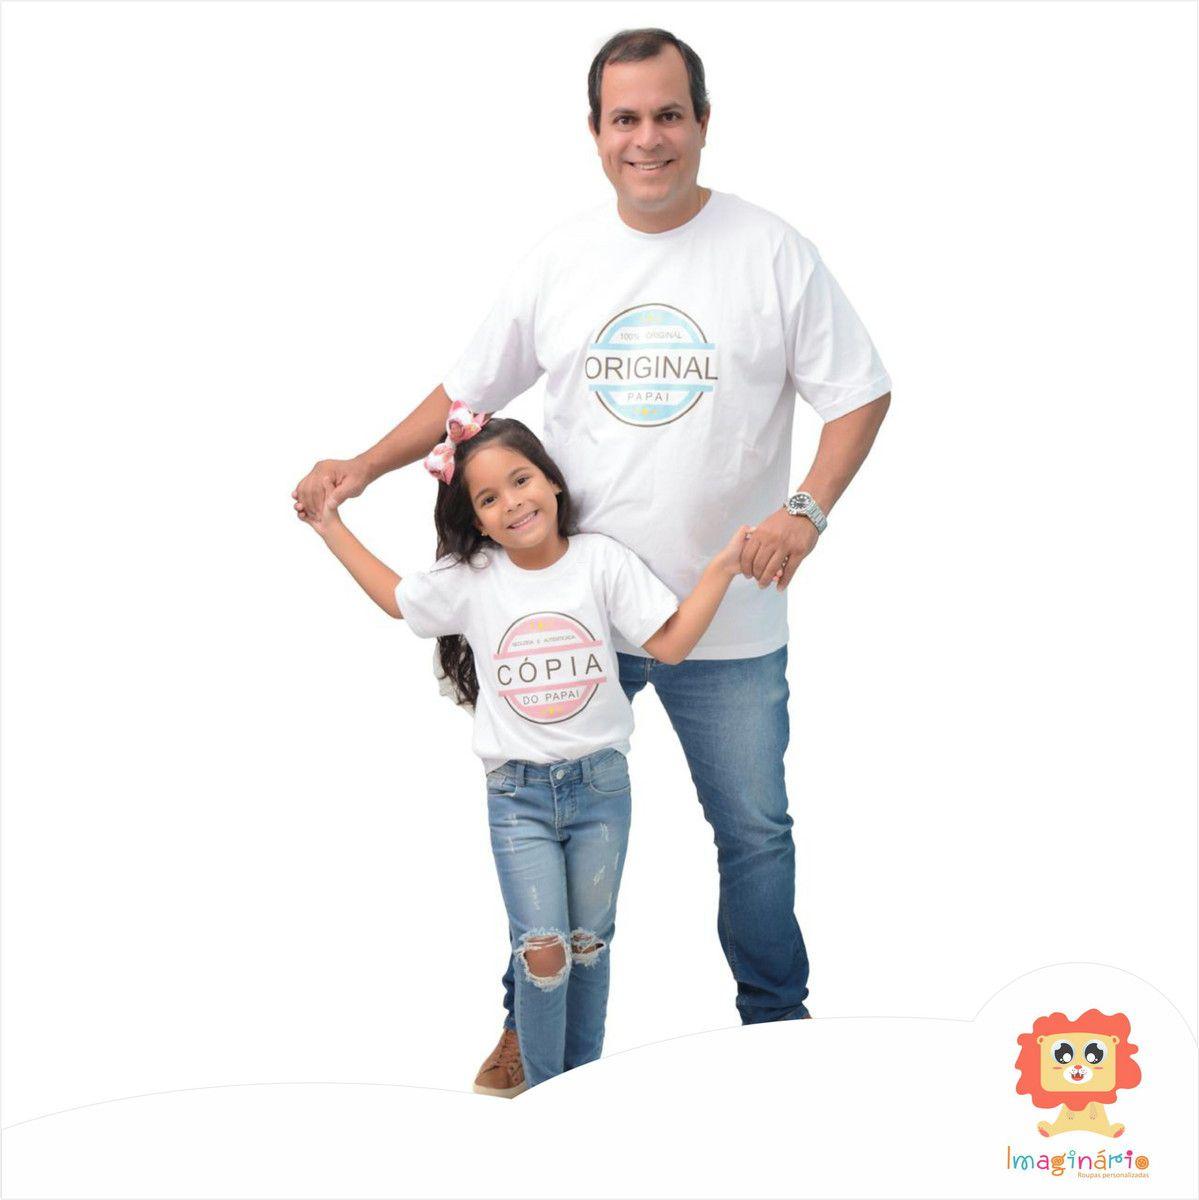 Kit Cópia do Papai - Dia dos Pais